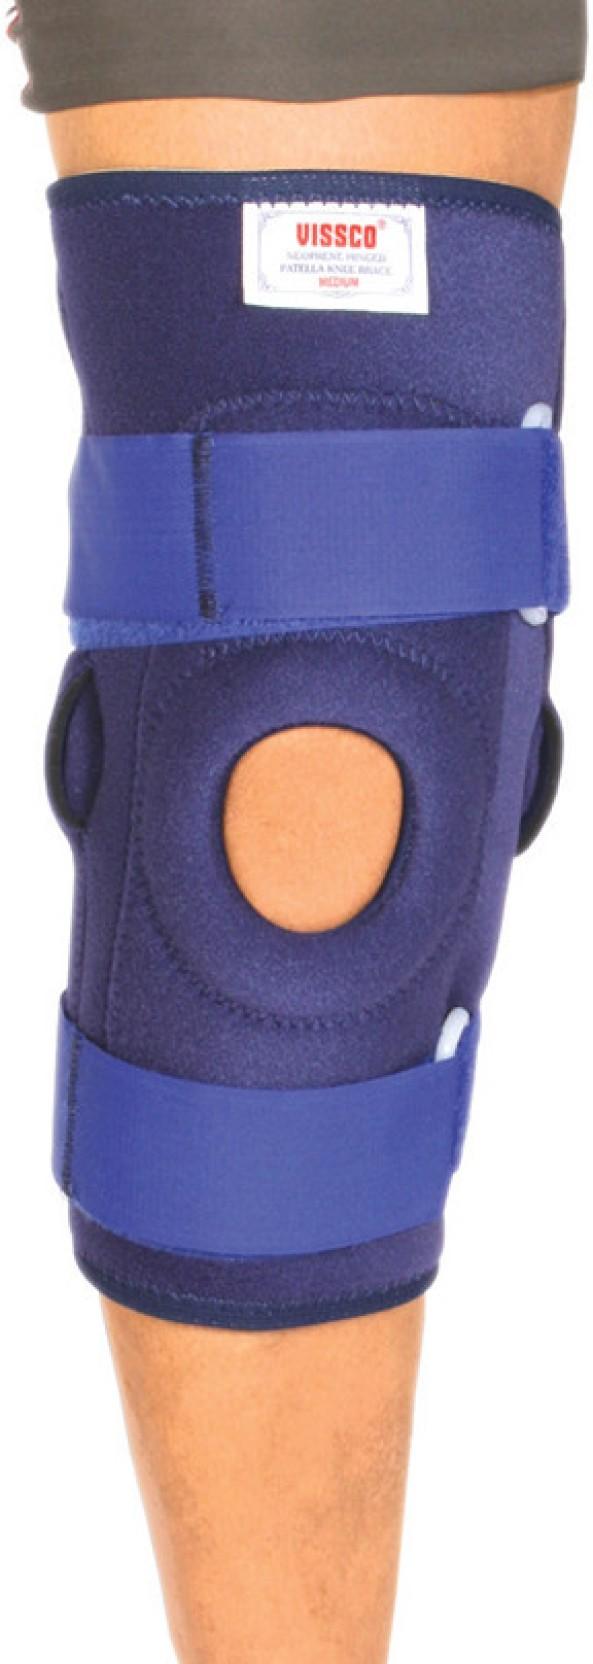 4e052f84c0 Vissco Neoprene Hinged Stabilizer Knee Support (L, Blue). ADD TO CART